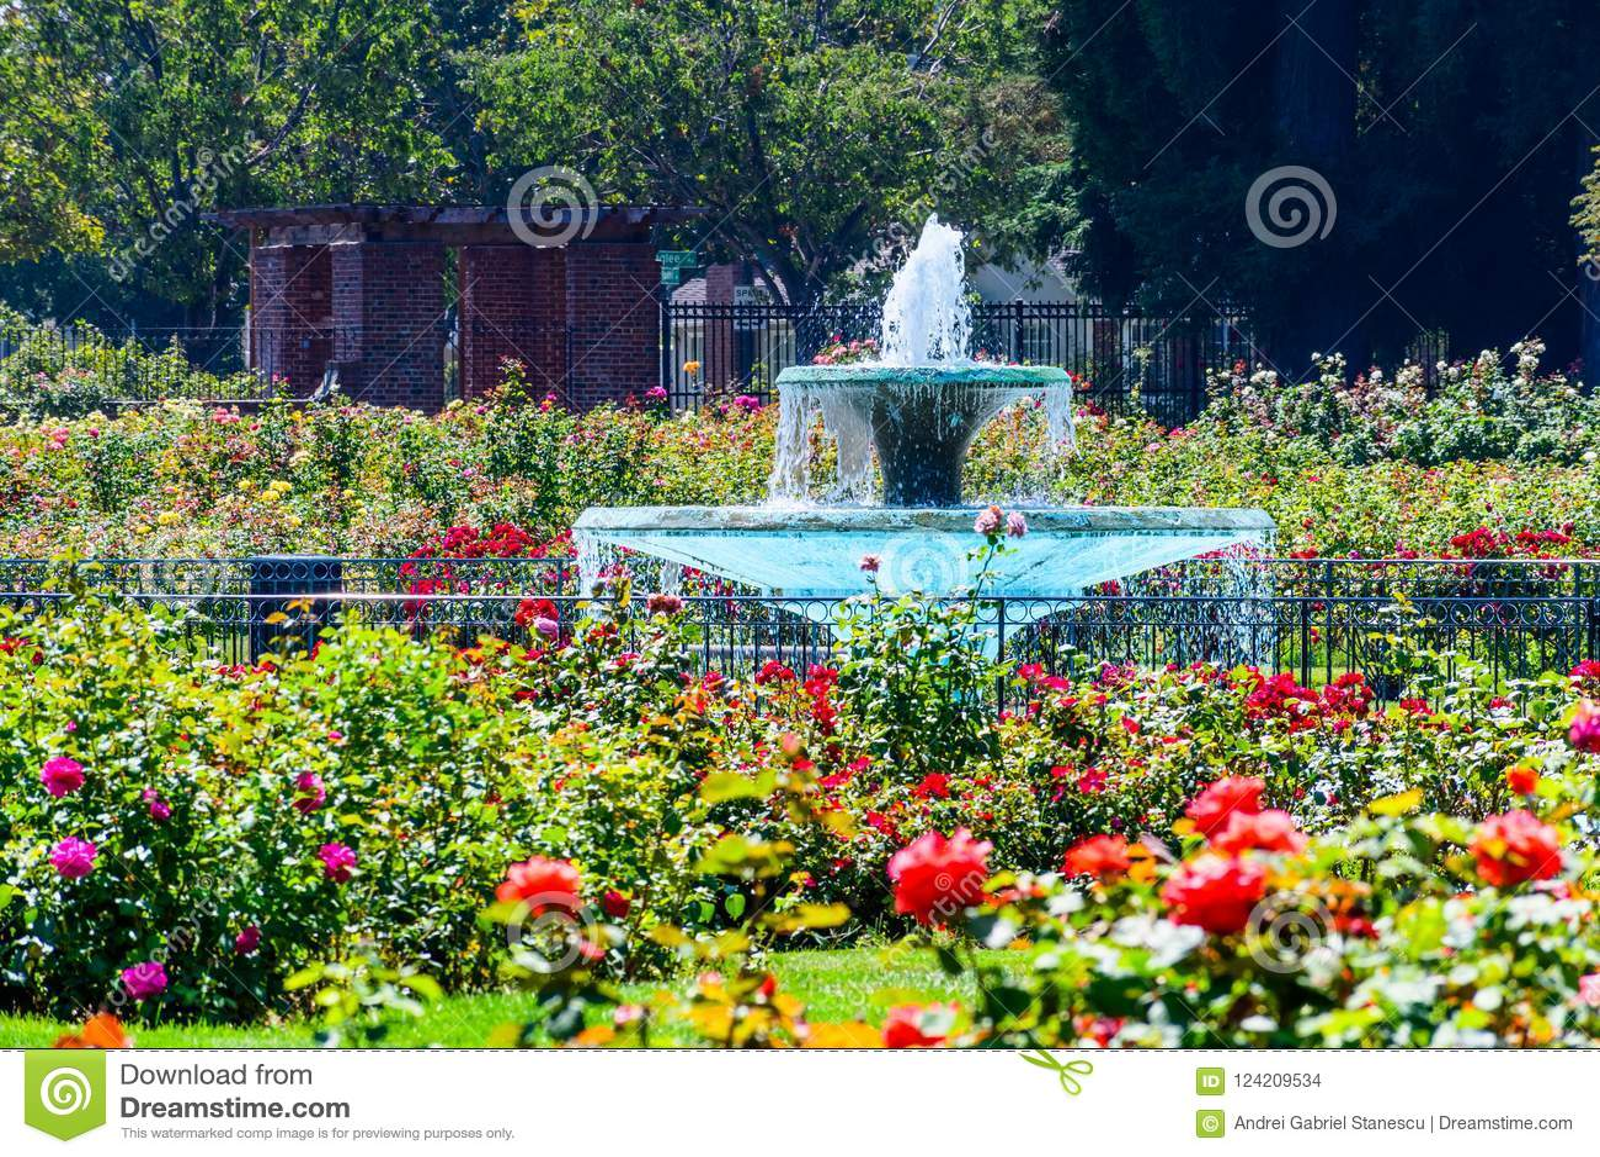 Landscape In The Municipal Rose Garden San Jose California Stock Photo Image Of Municipal Colors 124209534